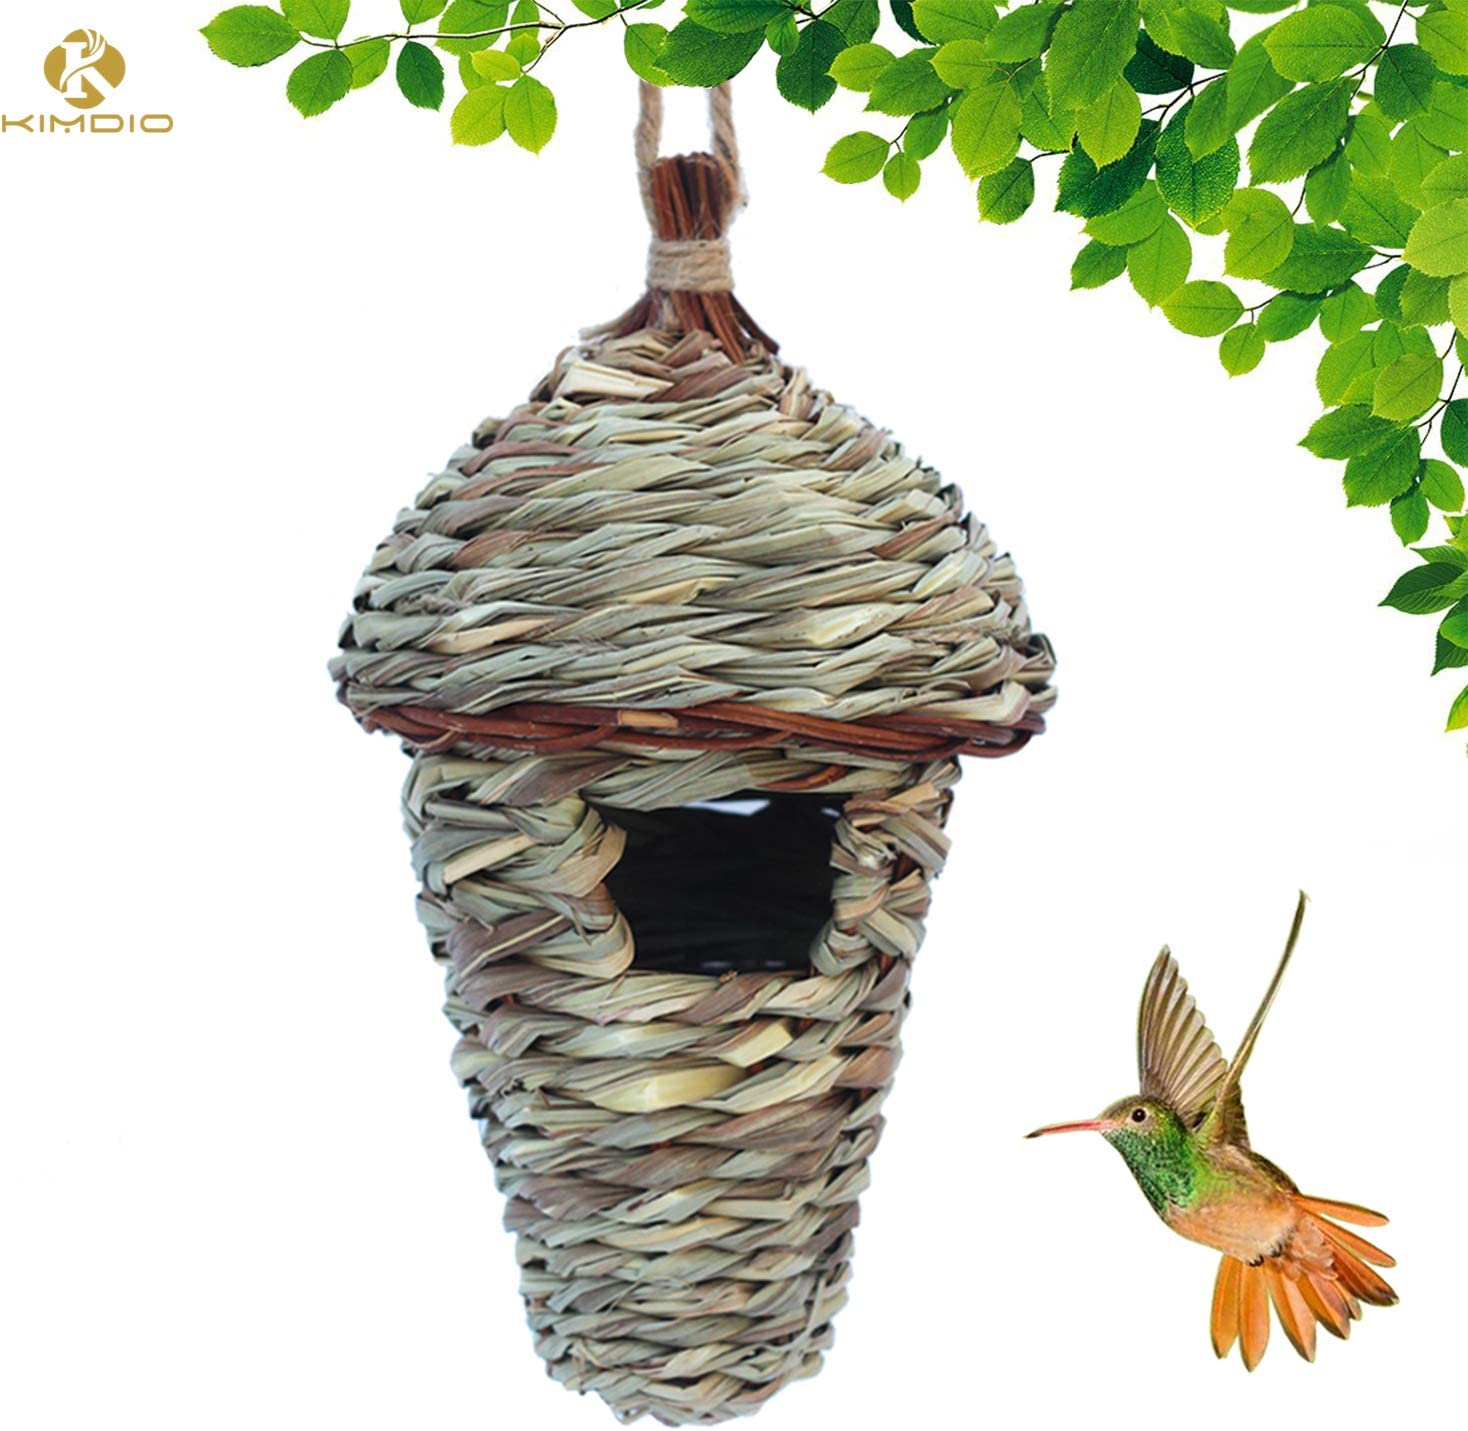 Hanging Birdhouse Hummingbird Nest Fiber Hand-Woven Roosting Bird House